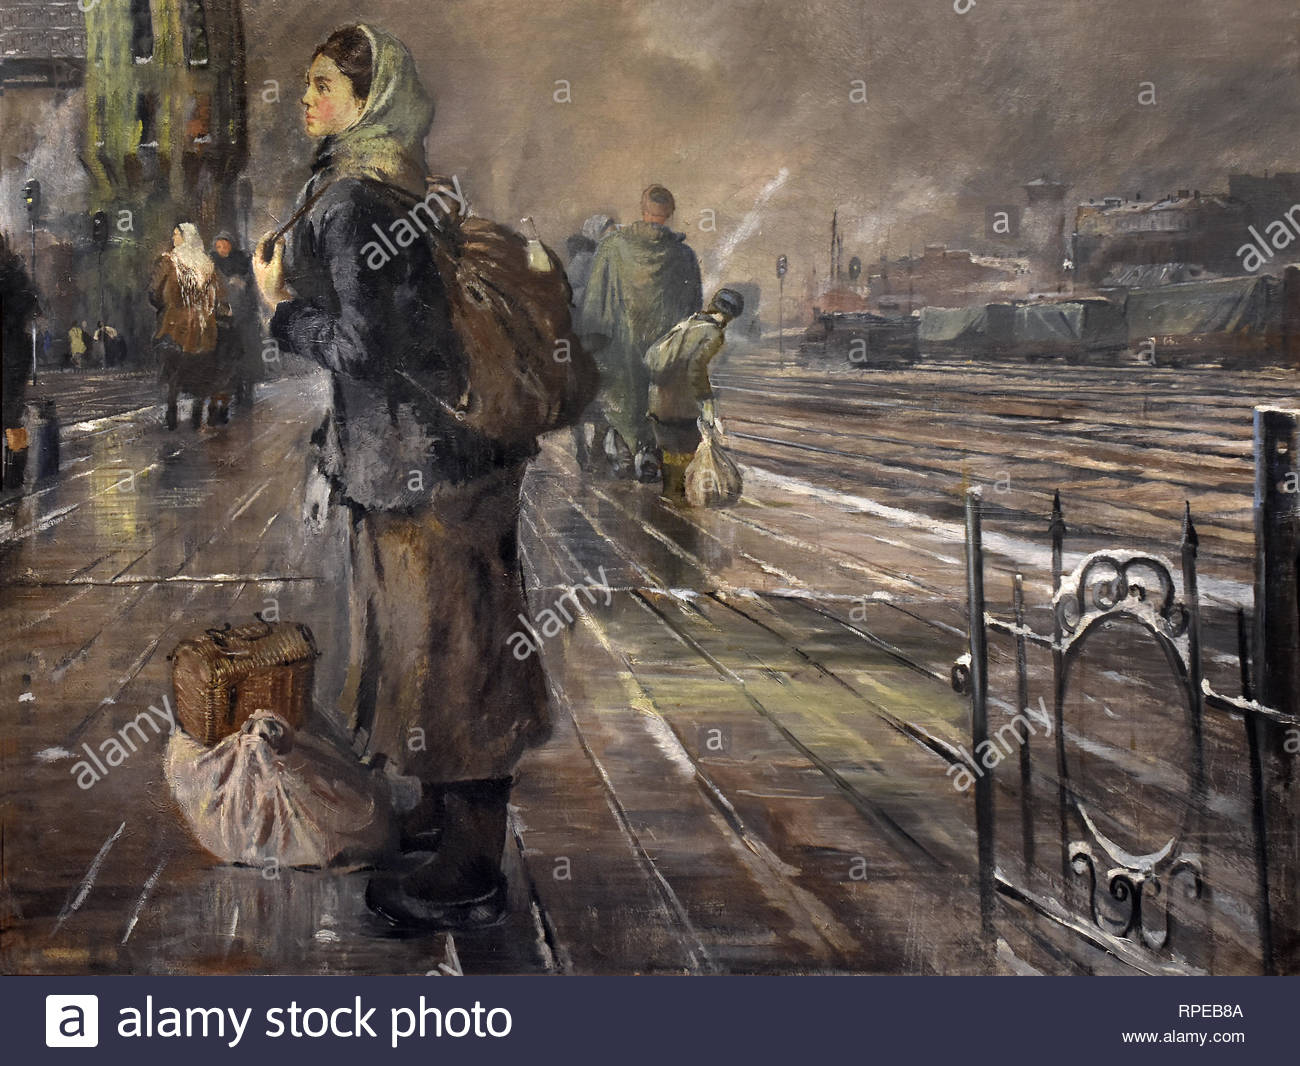 Autumn Station 1945 Yuri Pimenov. Soviet Union Communist Propaganda (Russia under Lenin and Stalin 1921-1953 ). - Stock Image